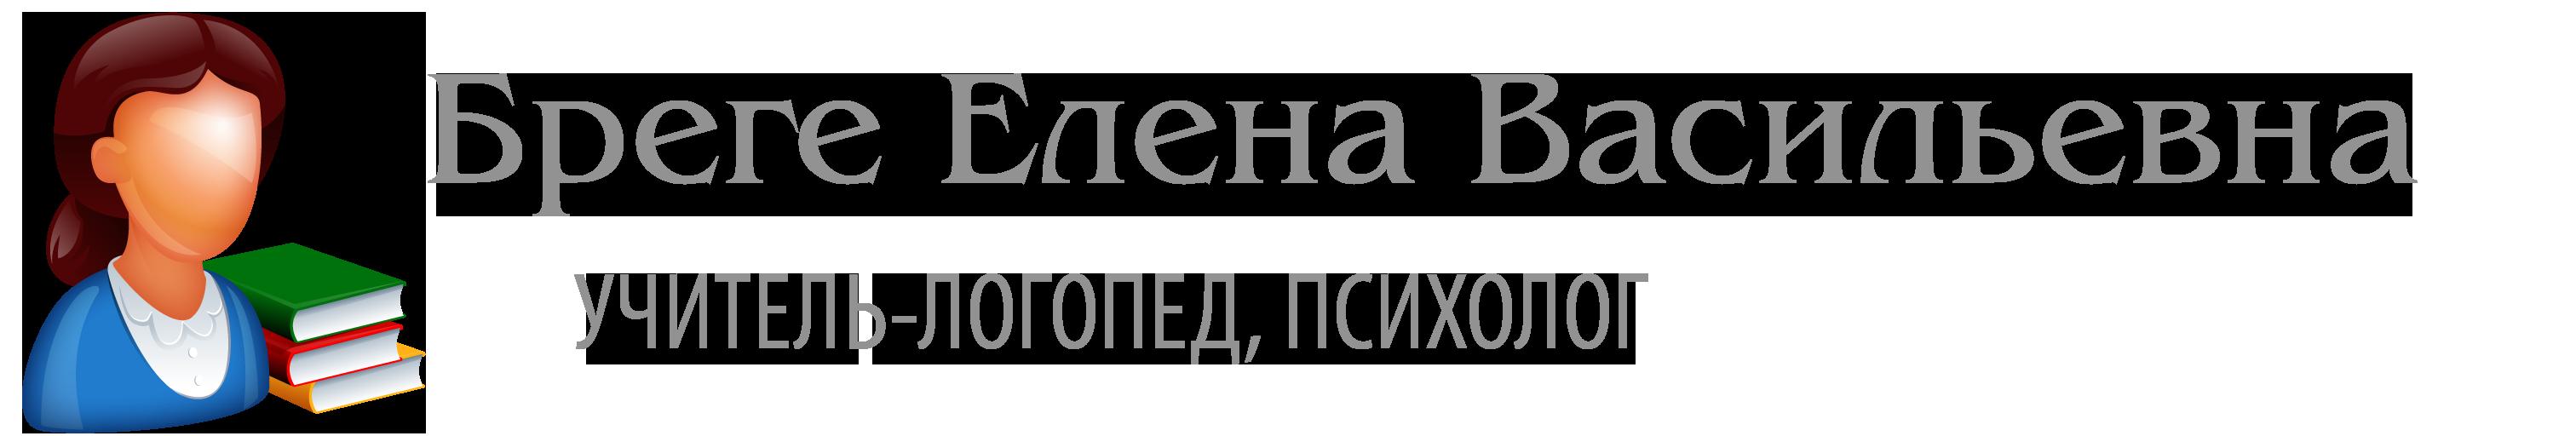 Бреге Елена Васильевна логопед Щелково